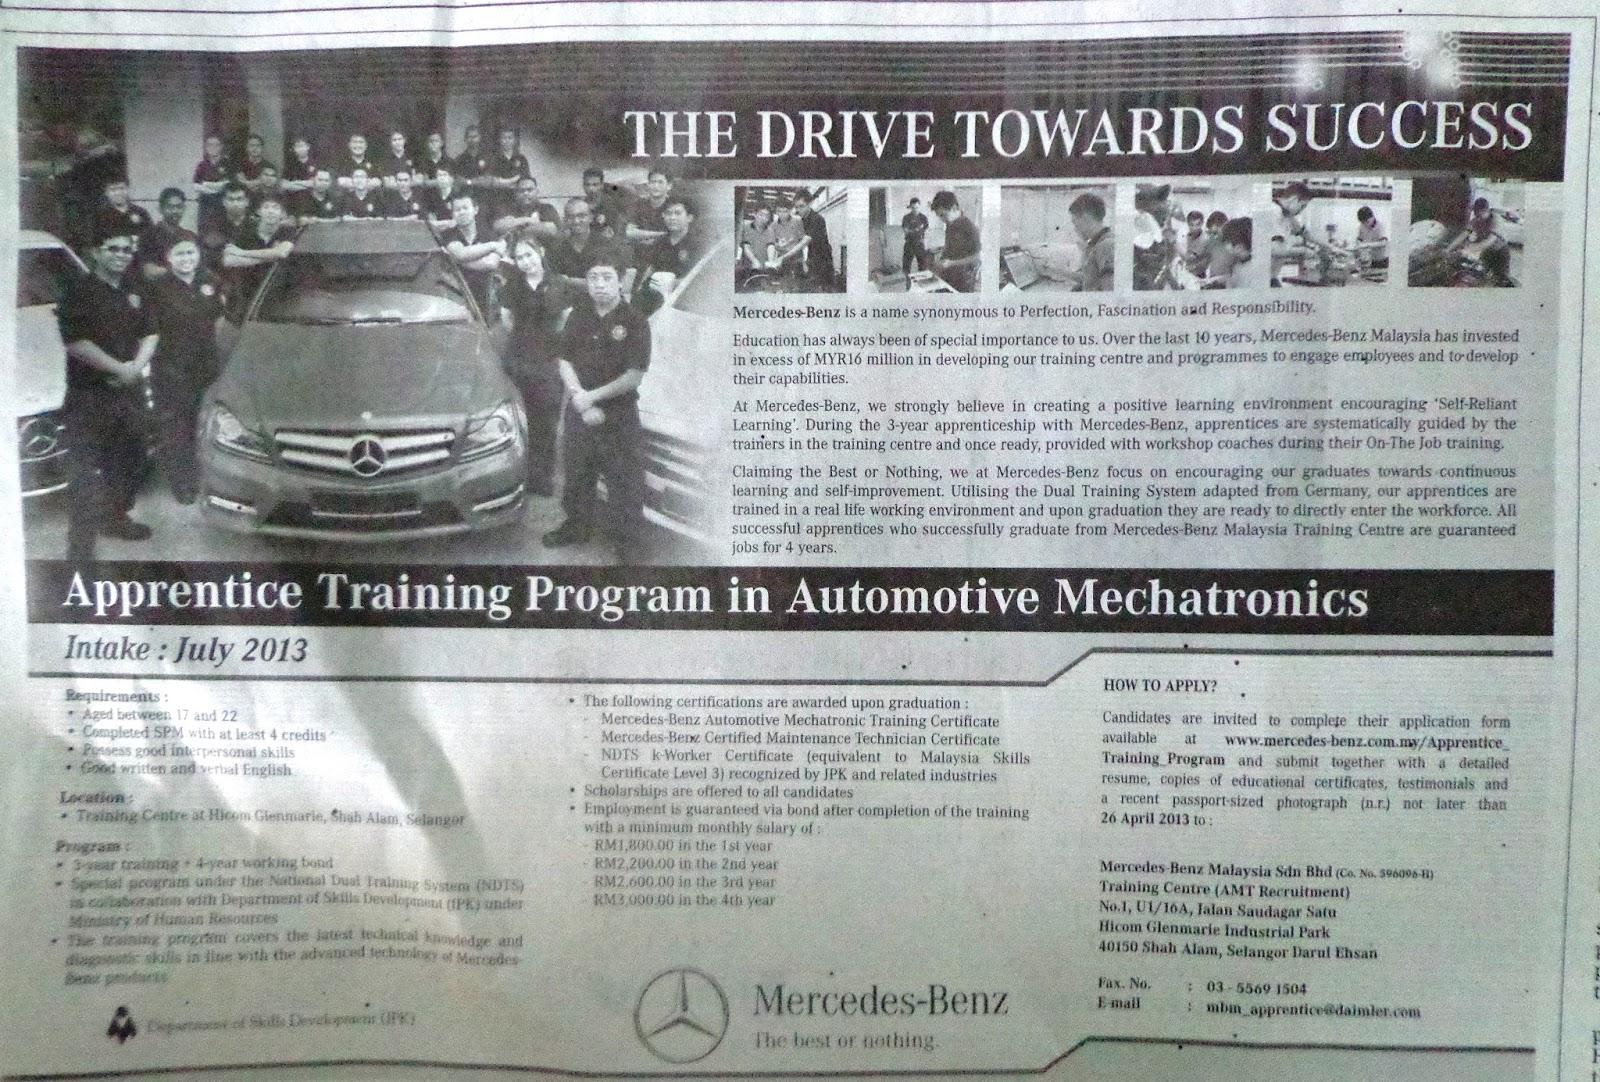 Pengajar april 2013 for Mercedes benz training program